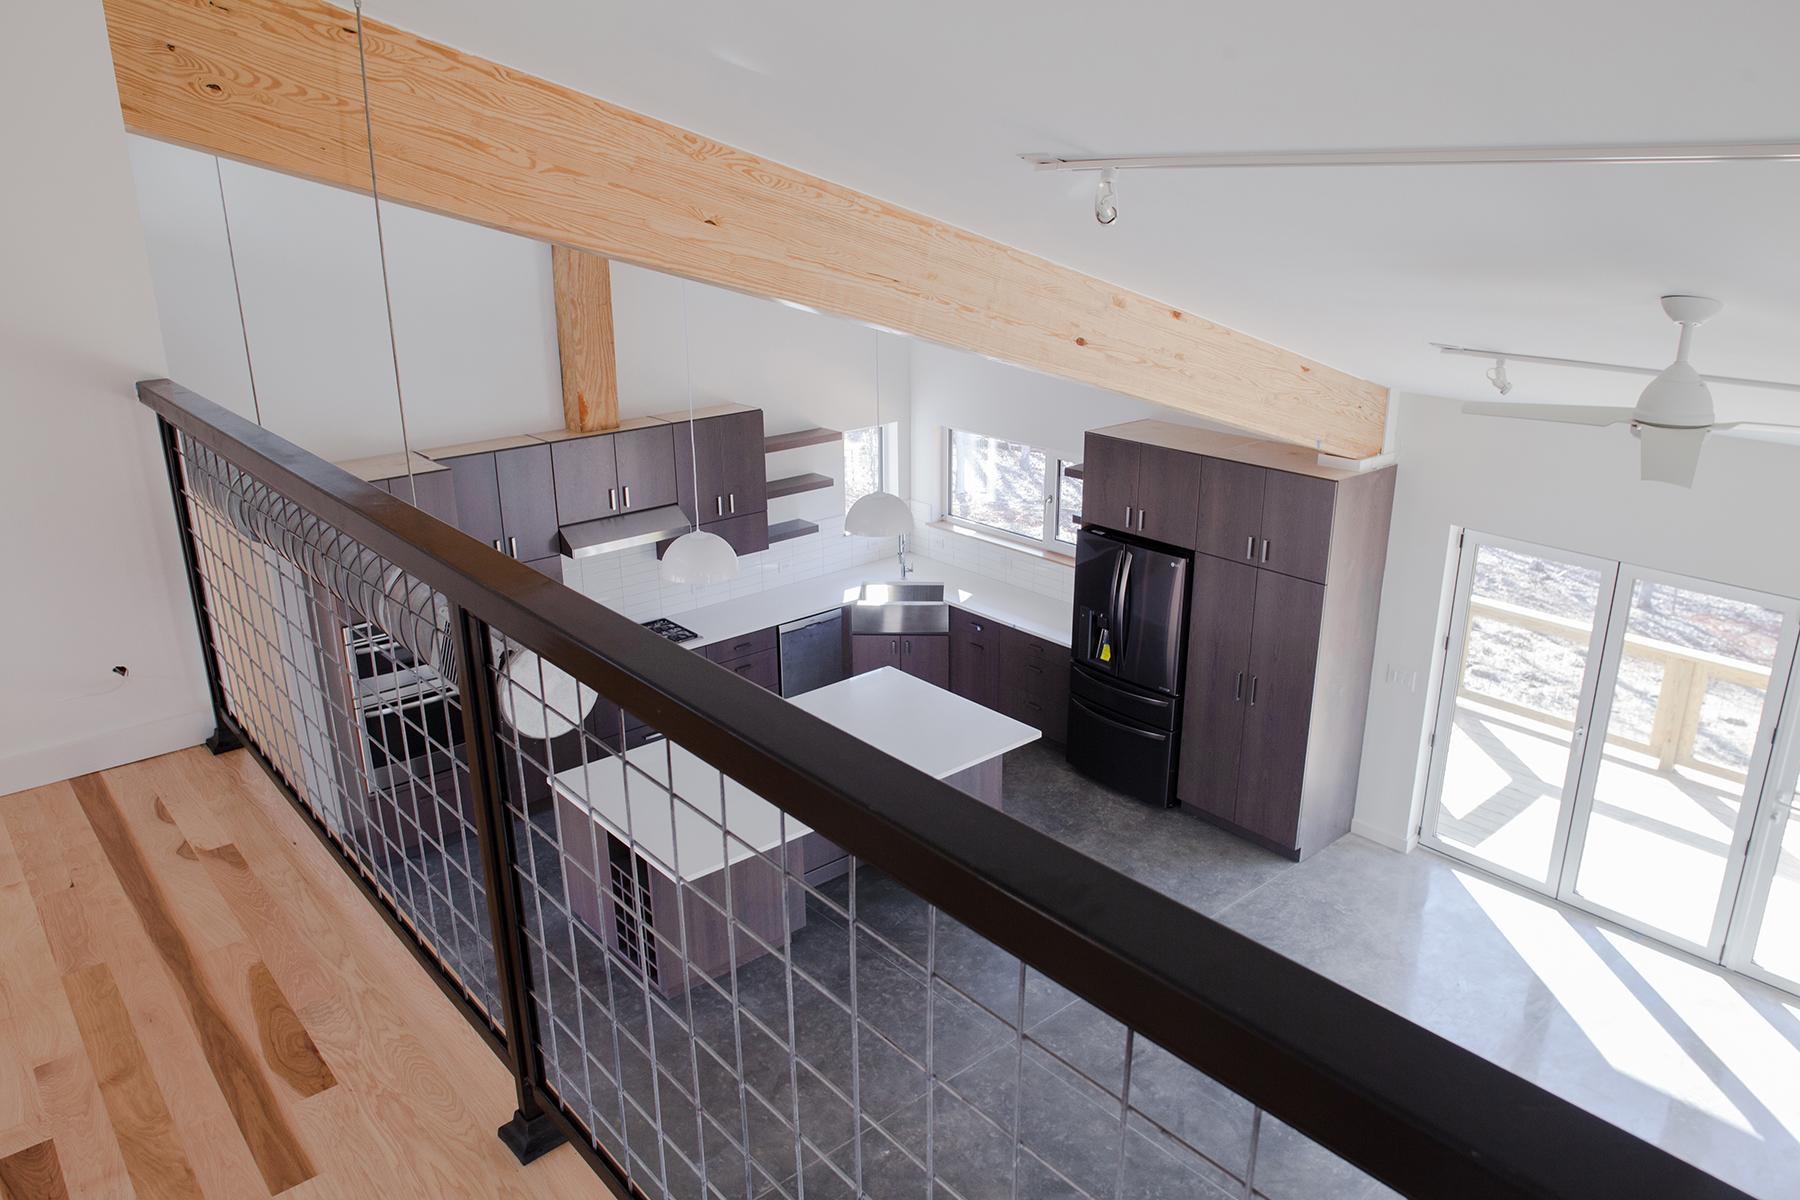 Bratton-view-from-loft_stehlihowelldesign.jpg